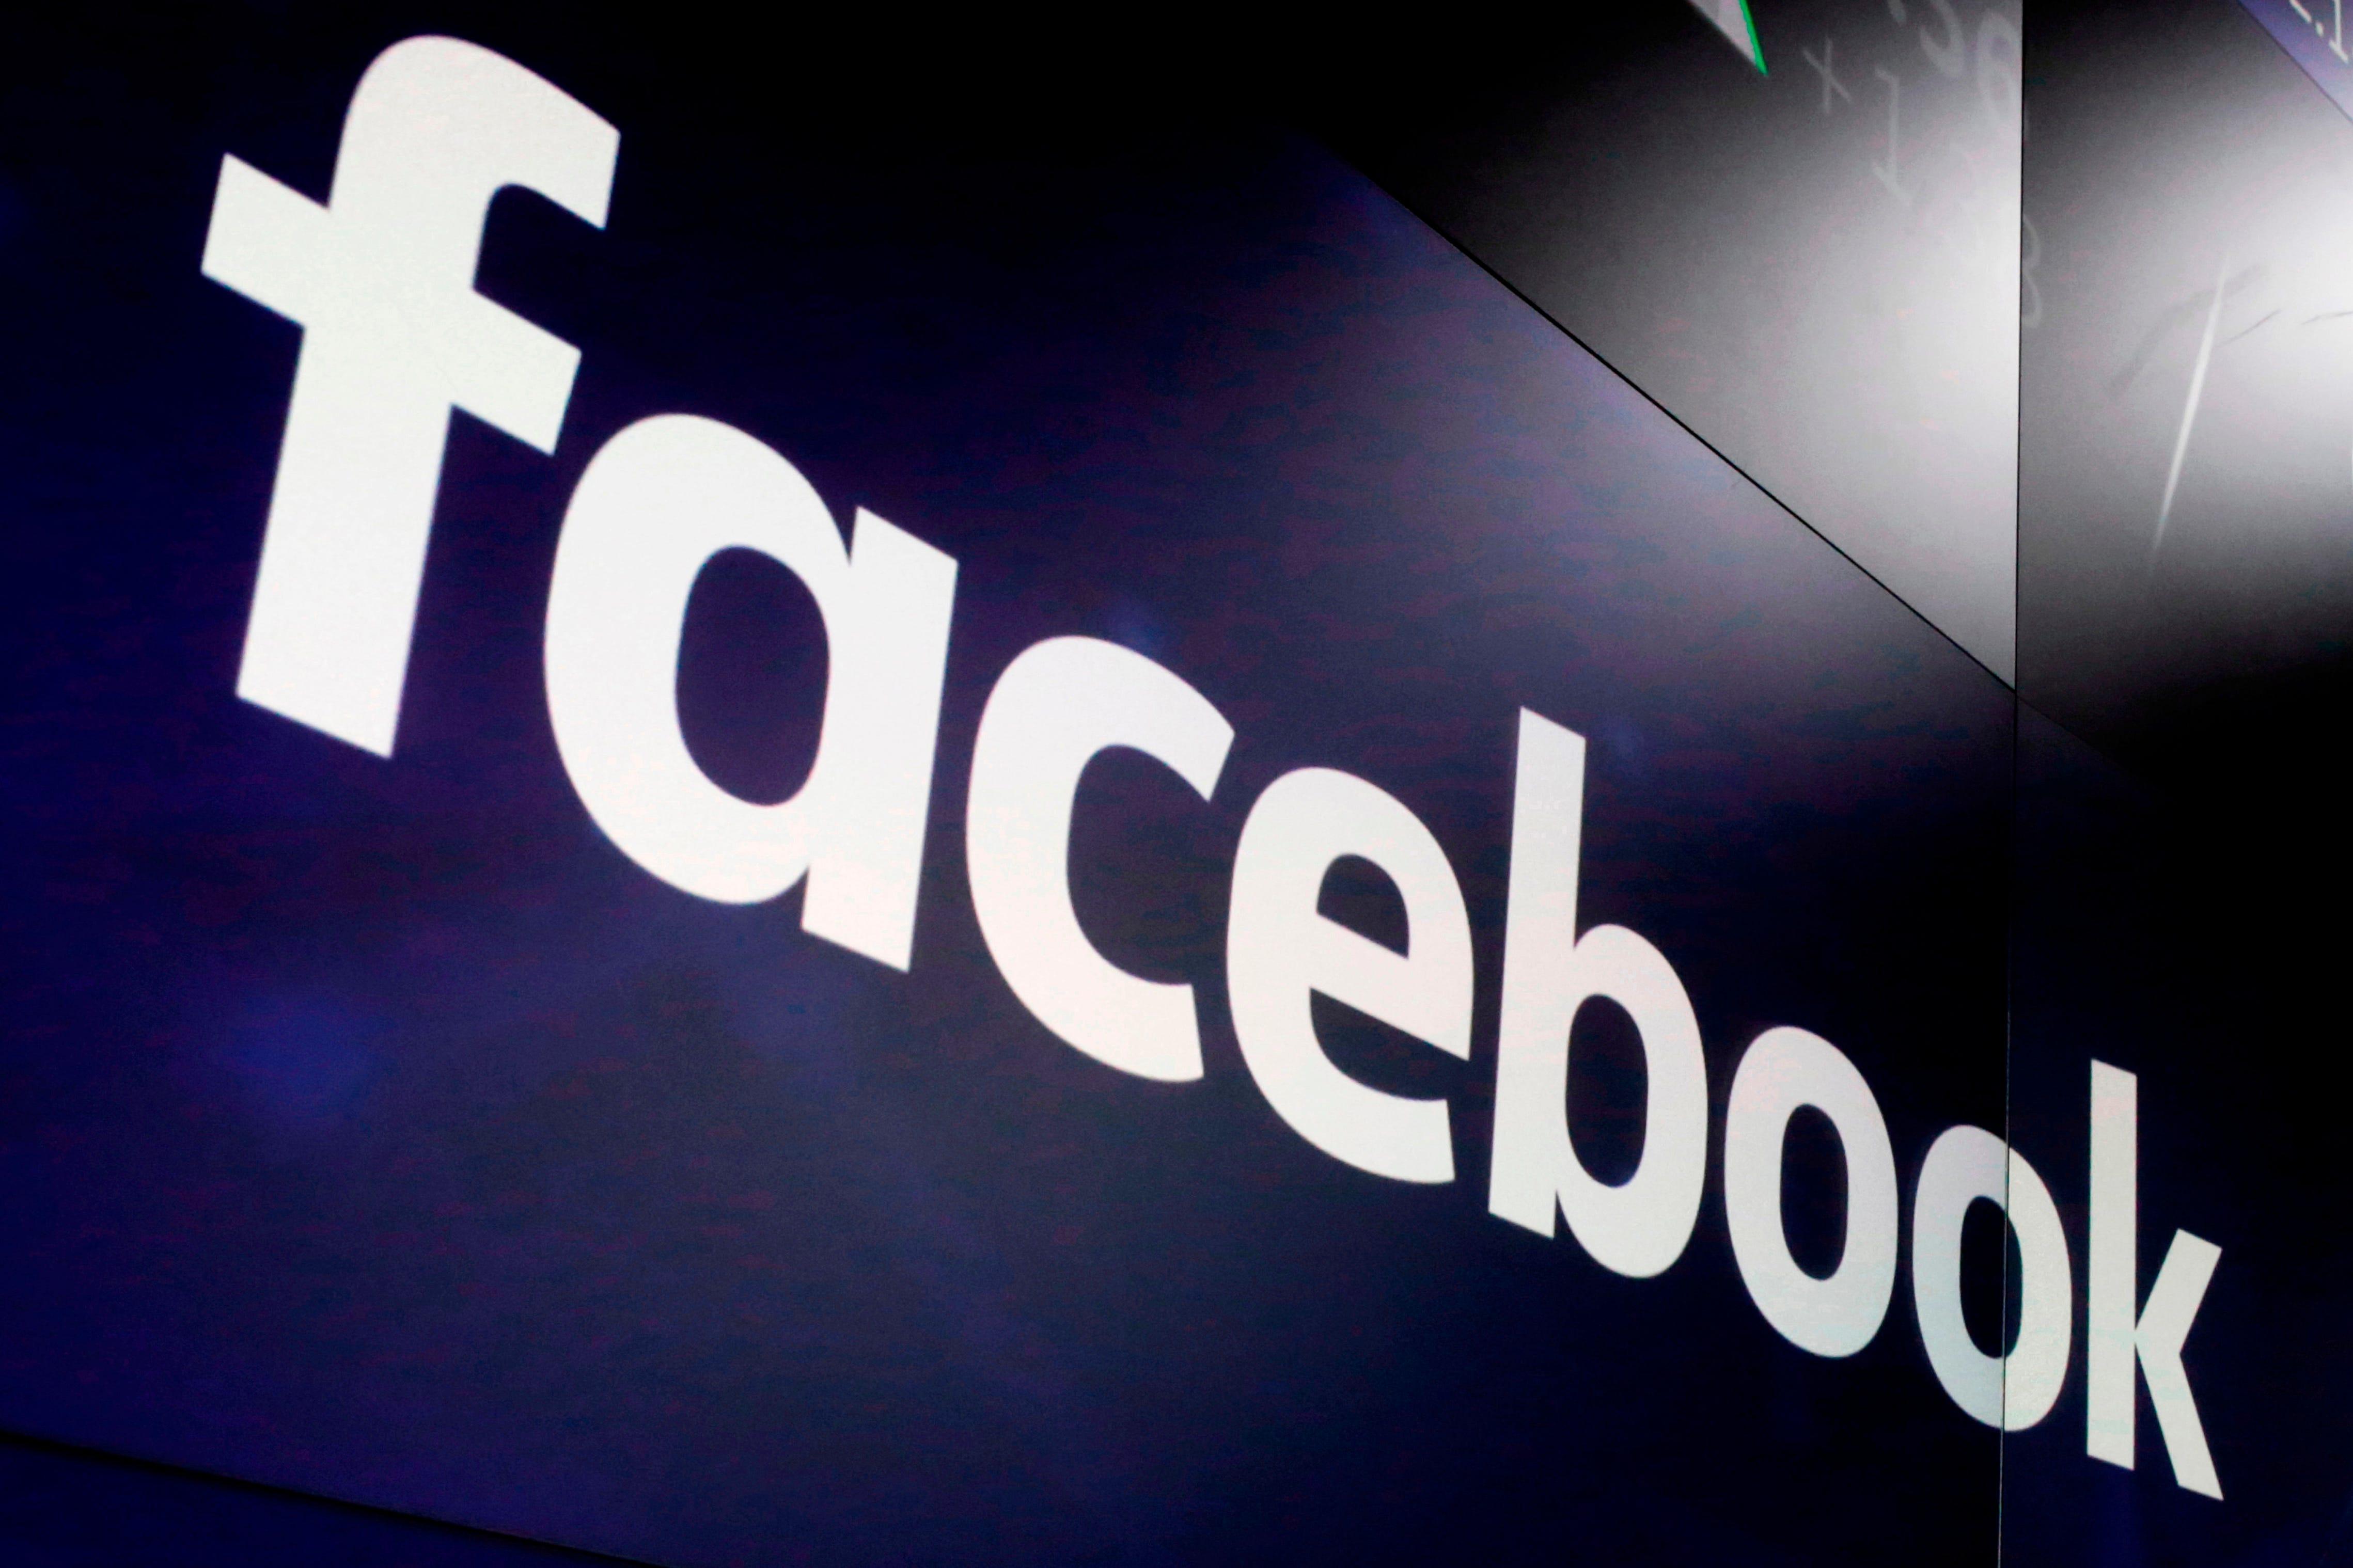 Facebook accuses Ukrainian programmer of selling 178 million users  data, files lawsuit